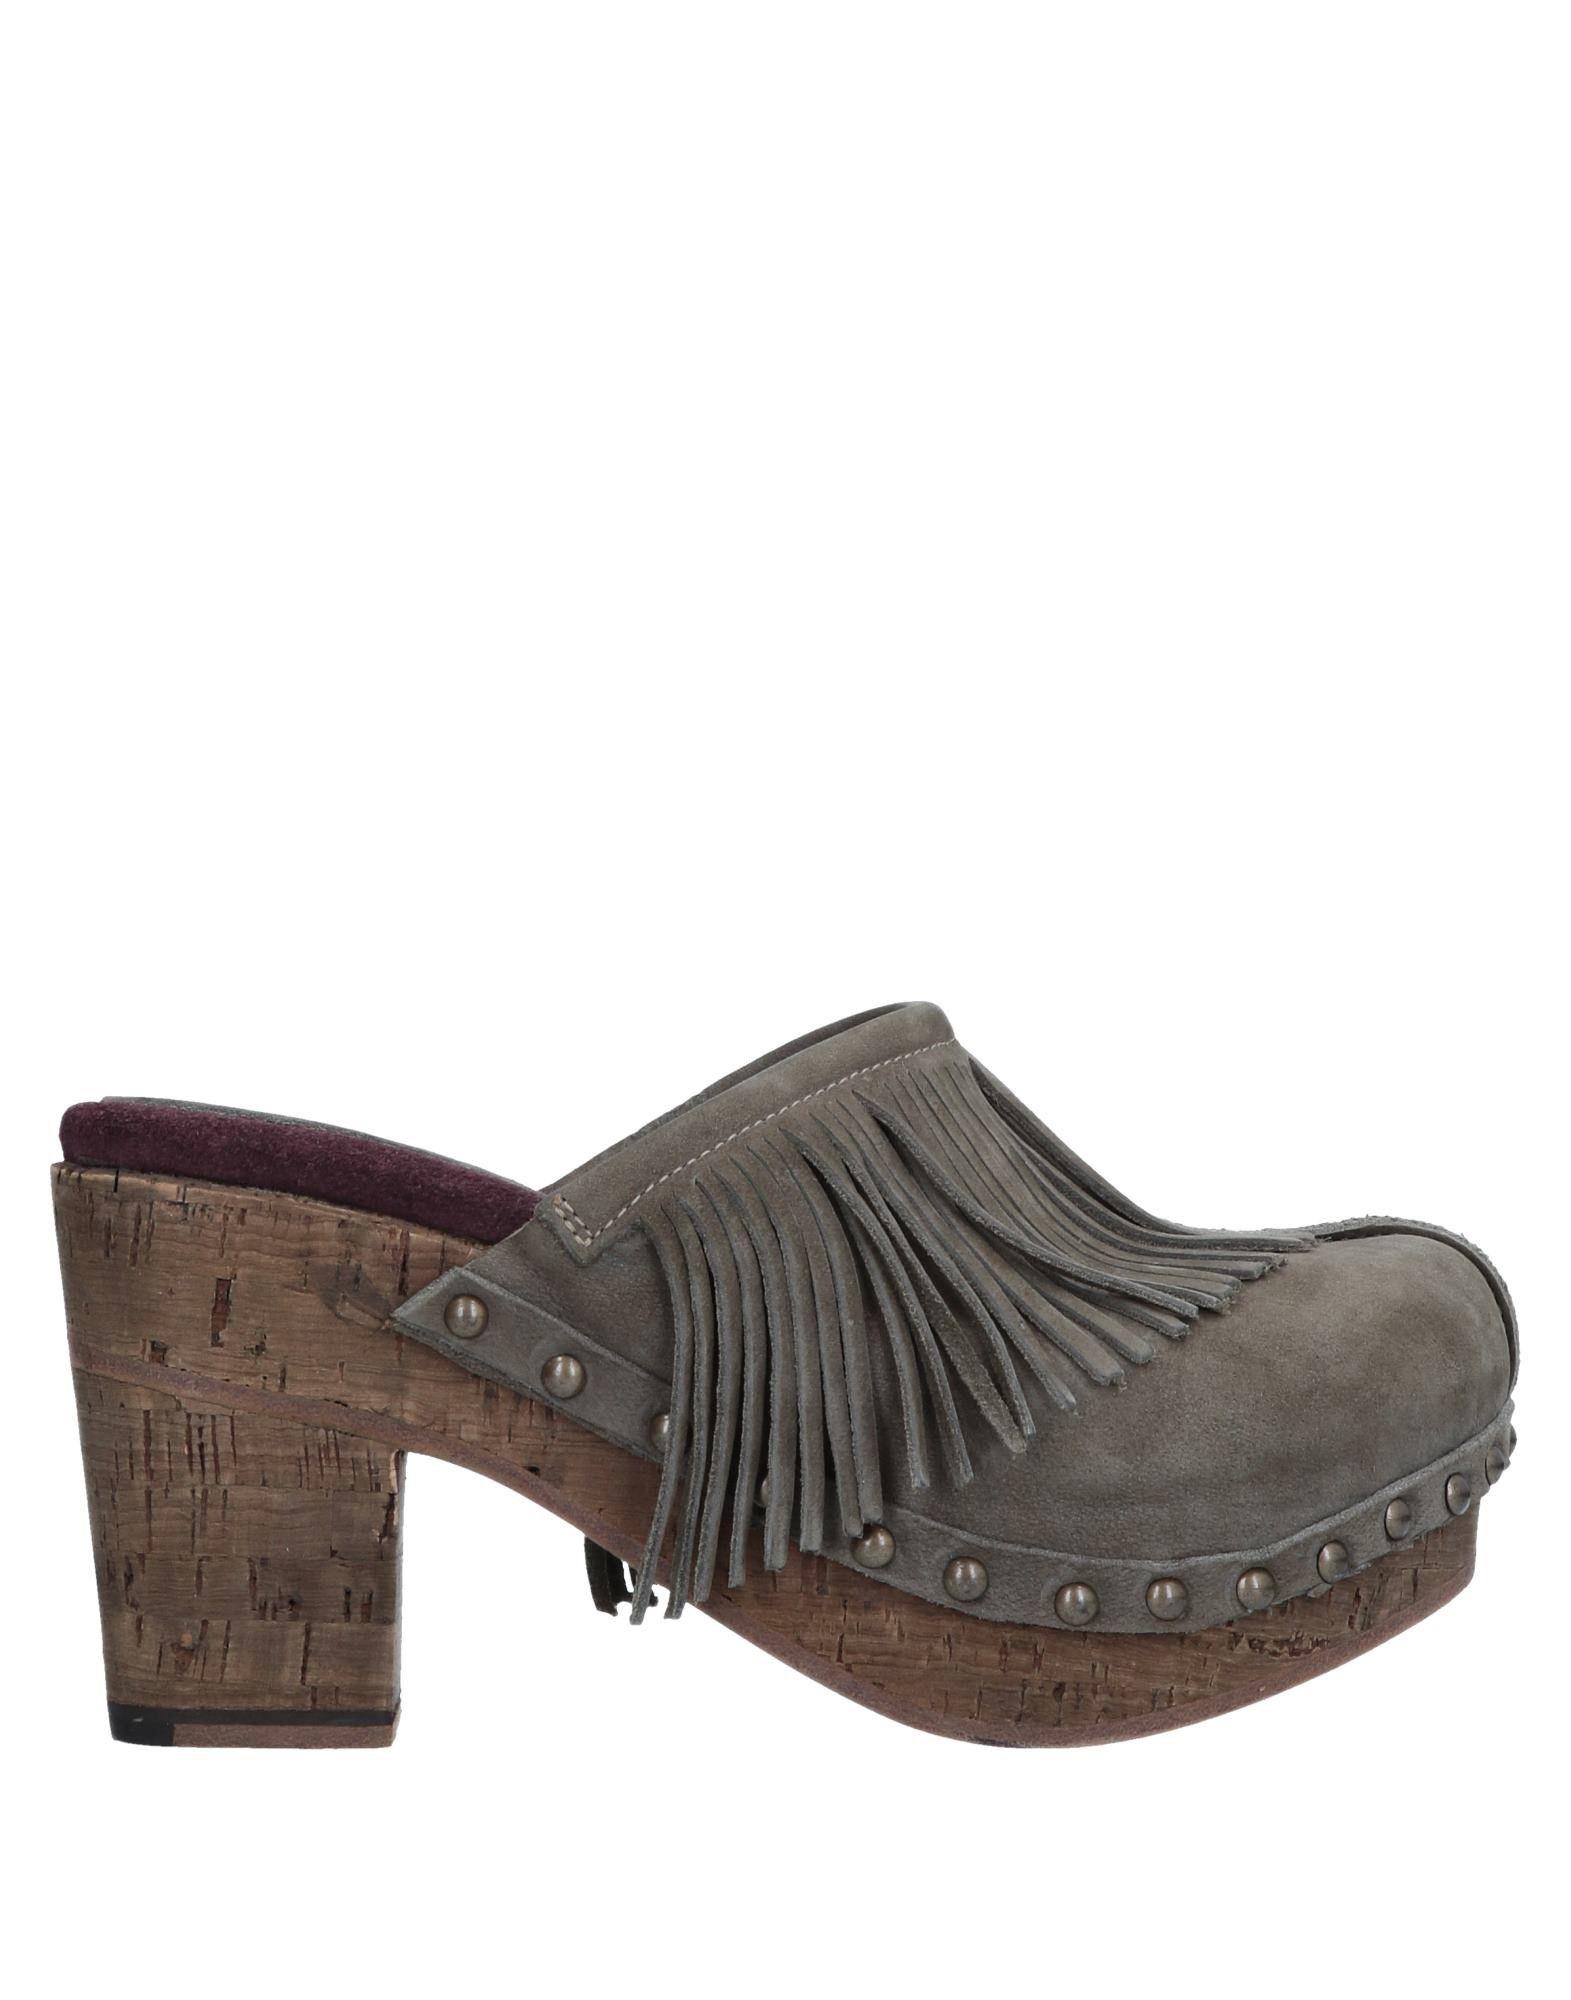 Fiorentini+Baker Pantoletten Damen  11545713TEGut aussehende strapazierfähige Schuhe